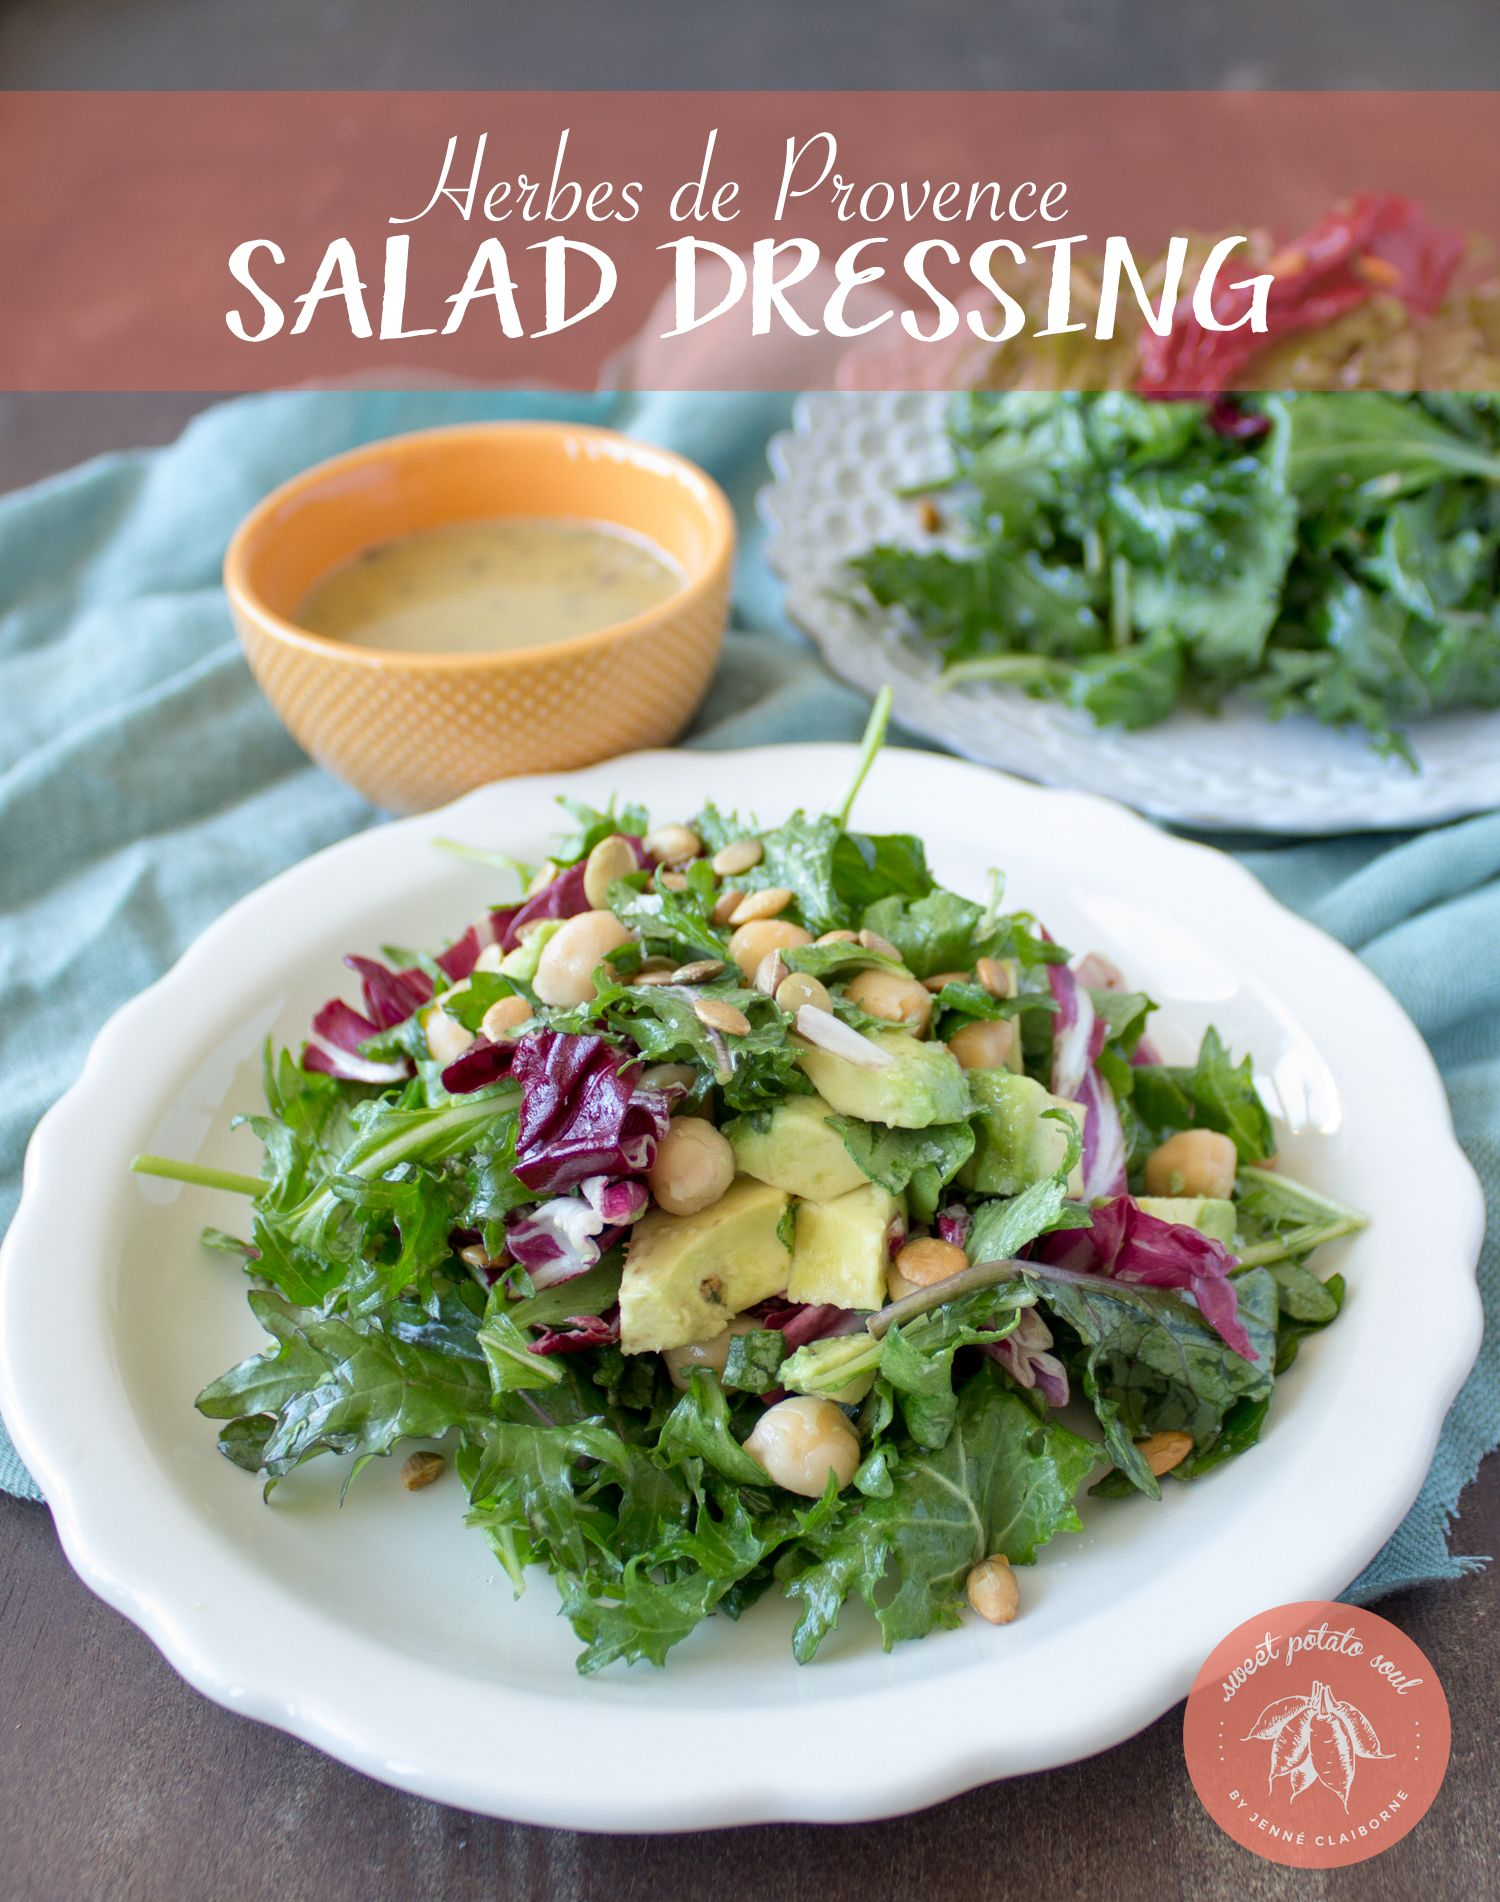 herbes de provence salad dressing recipe herbes de provence dressing and salad dressings. Black Bedroom Furniture Sets. Home Design Ideas